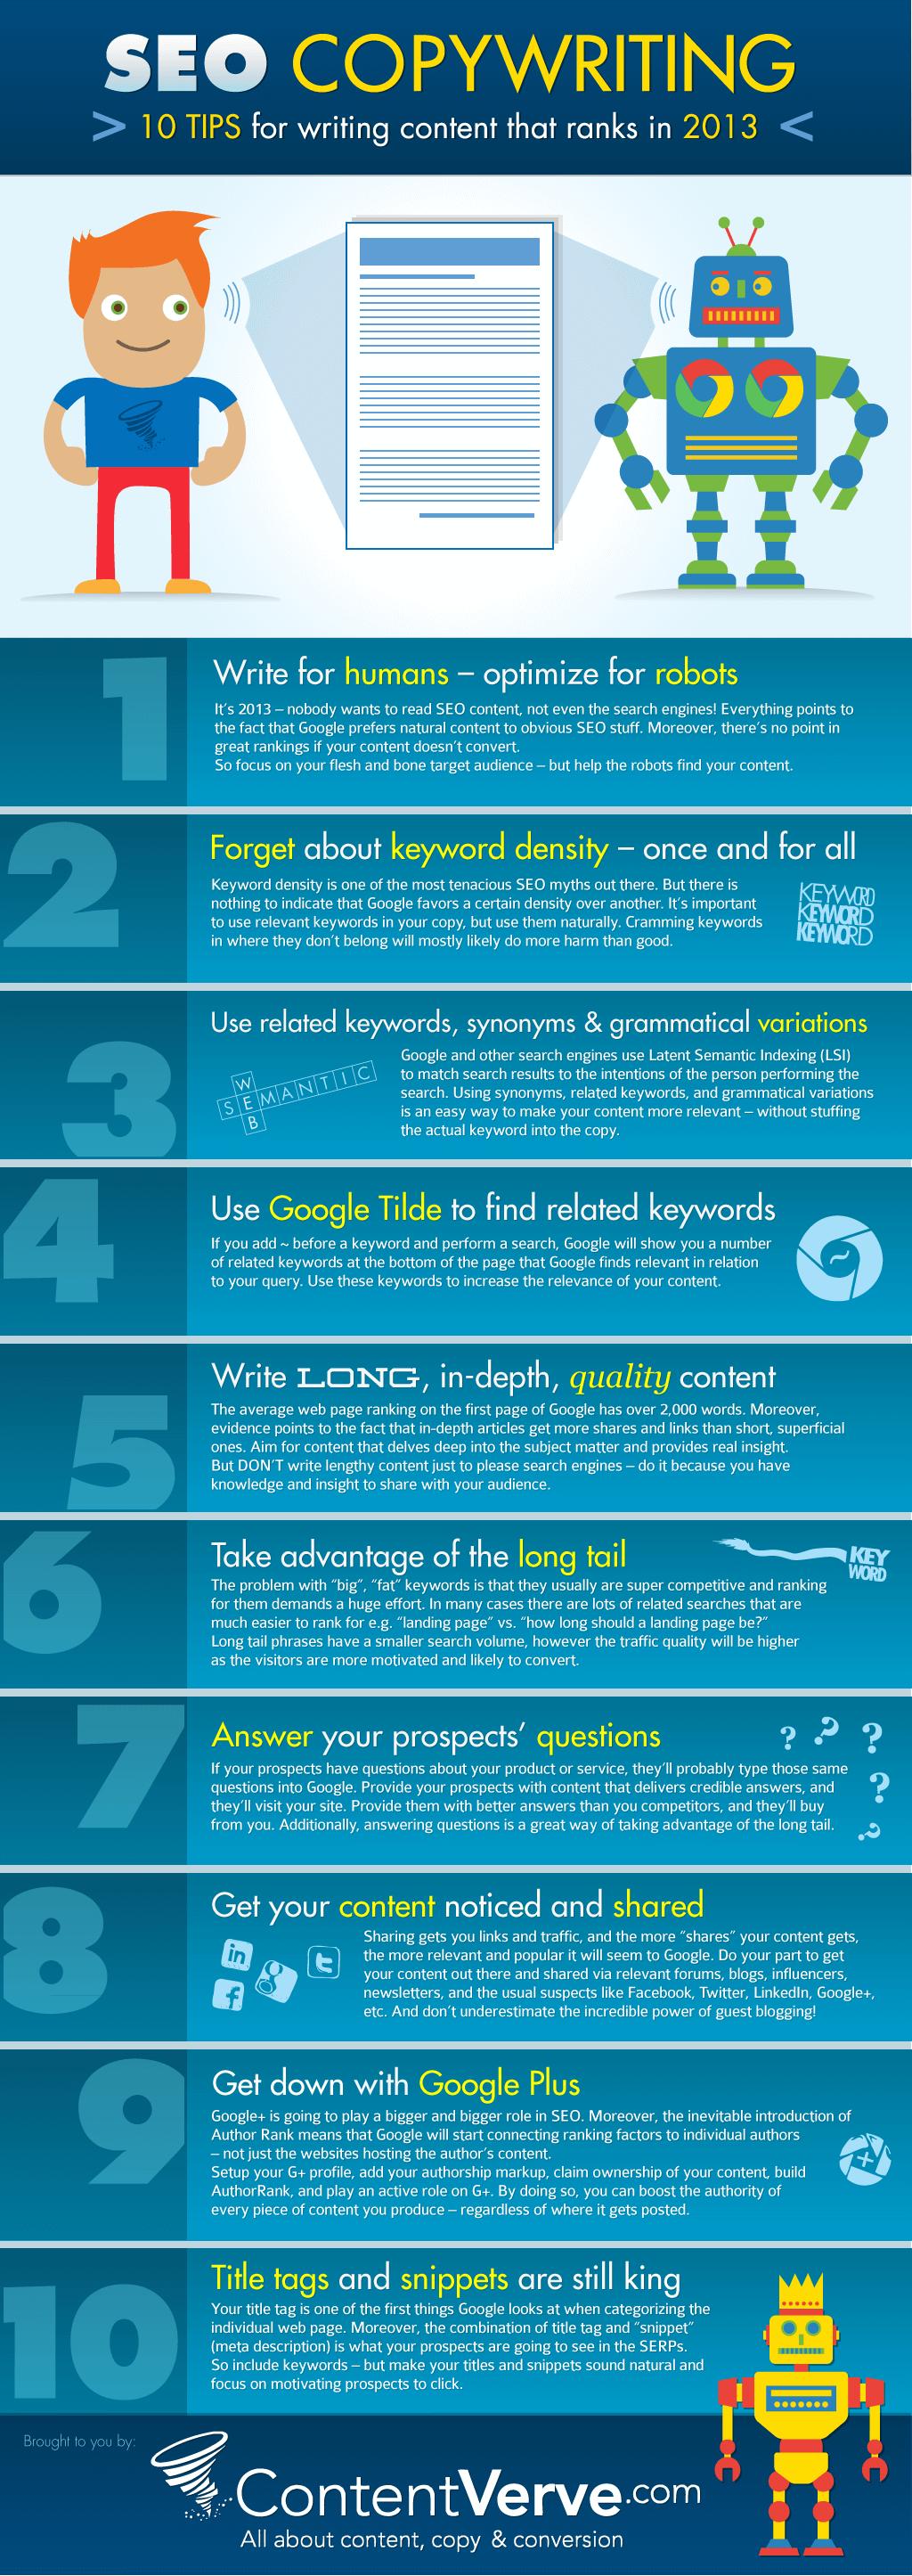 copywriting-tips-SEO